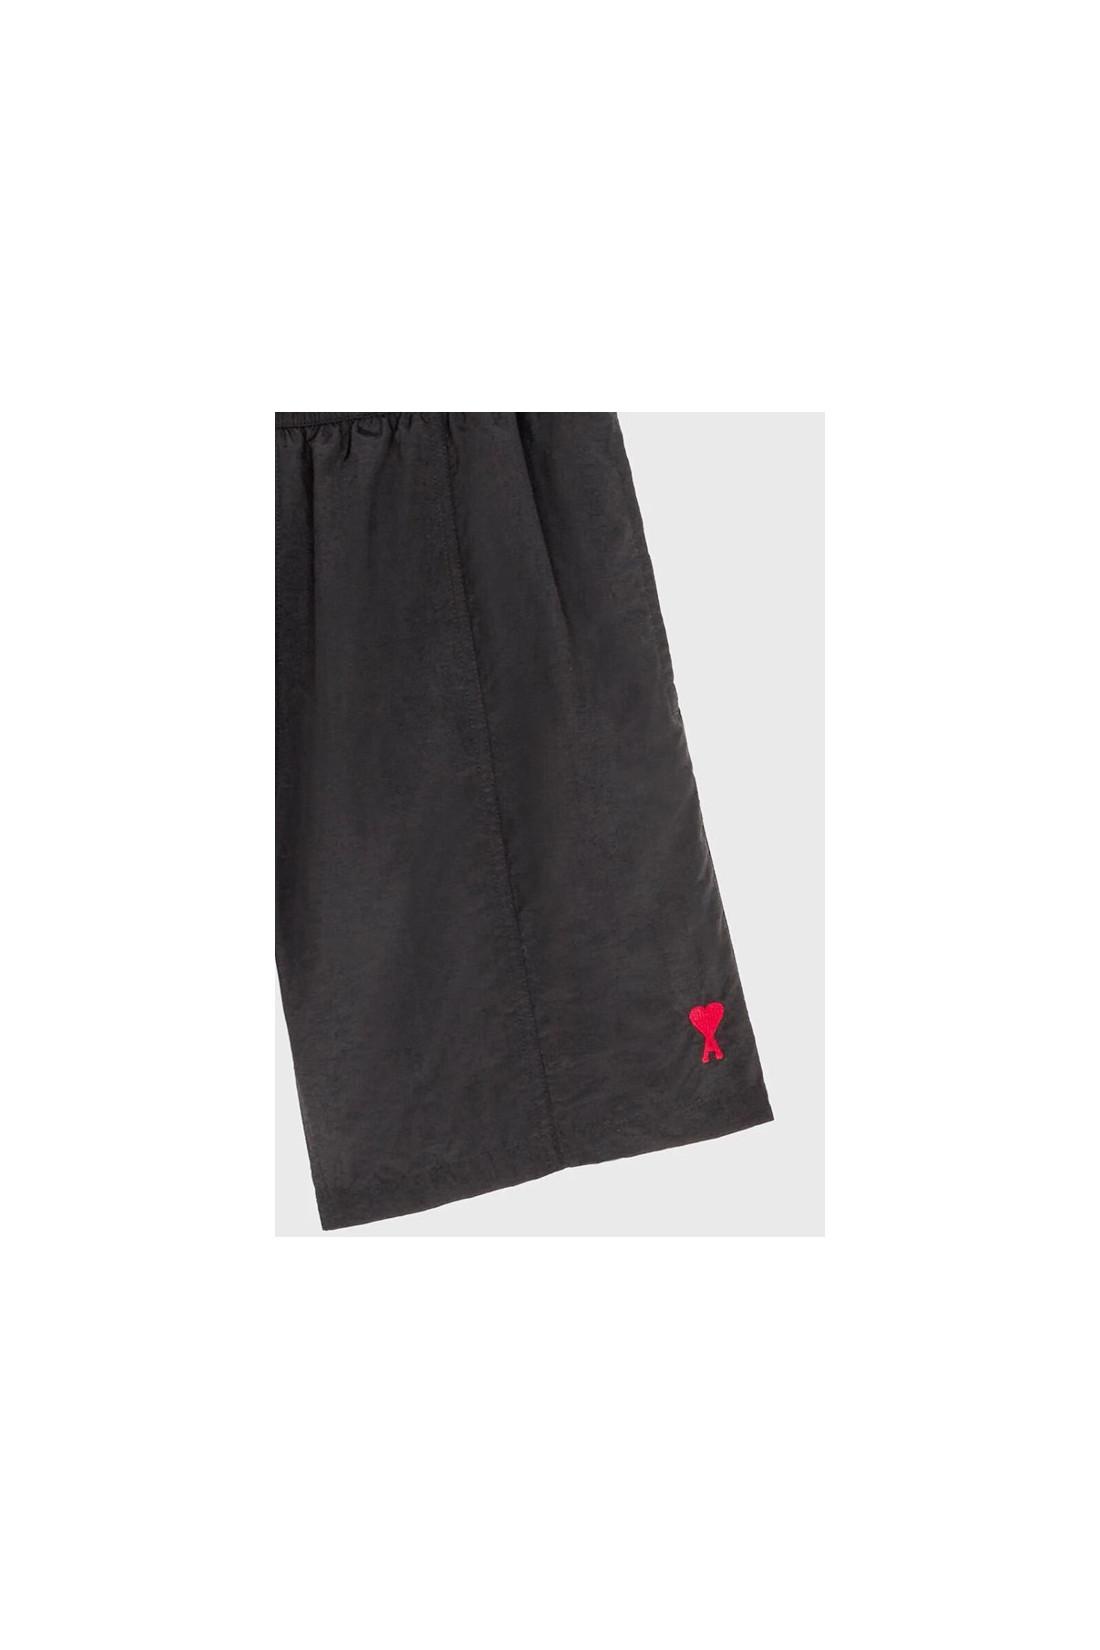 AMI / Ami de coeur long swim shorts Noir